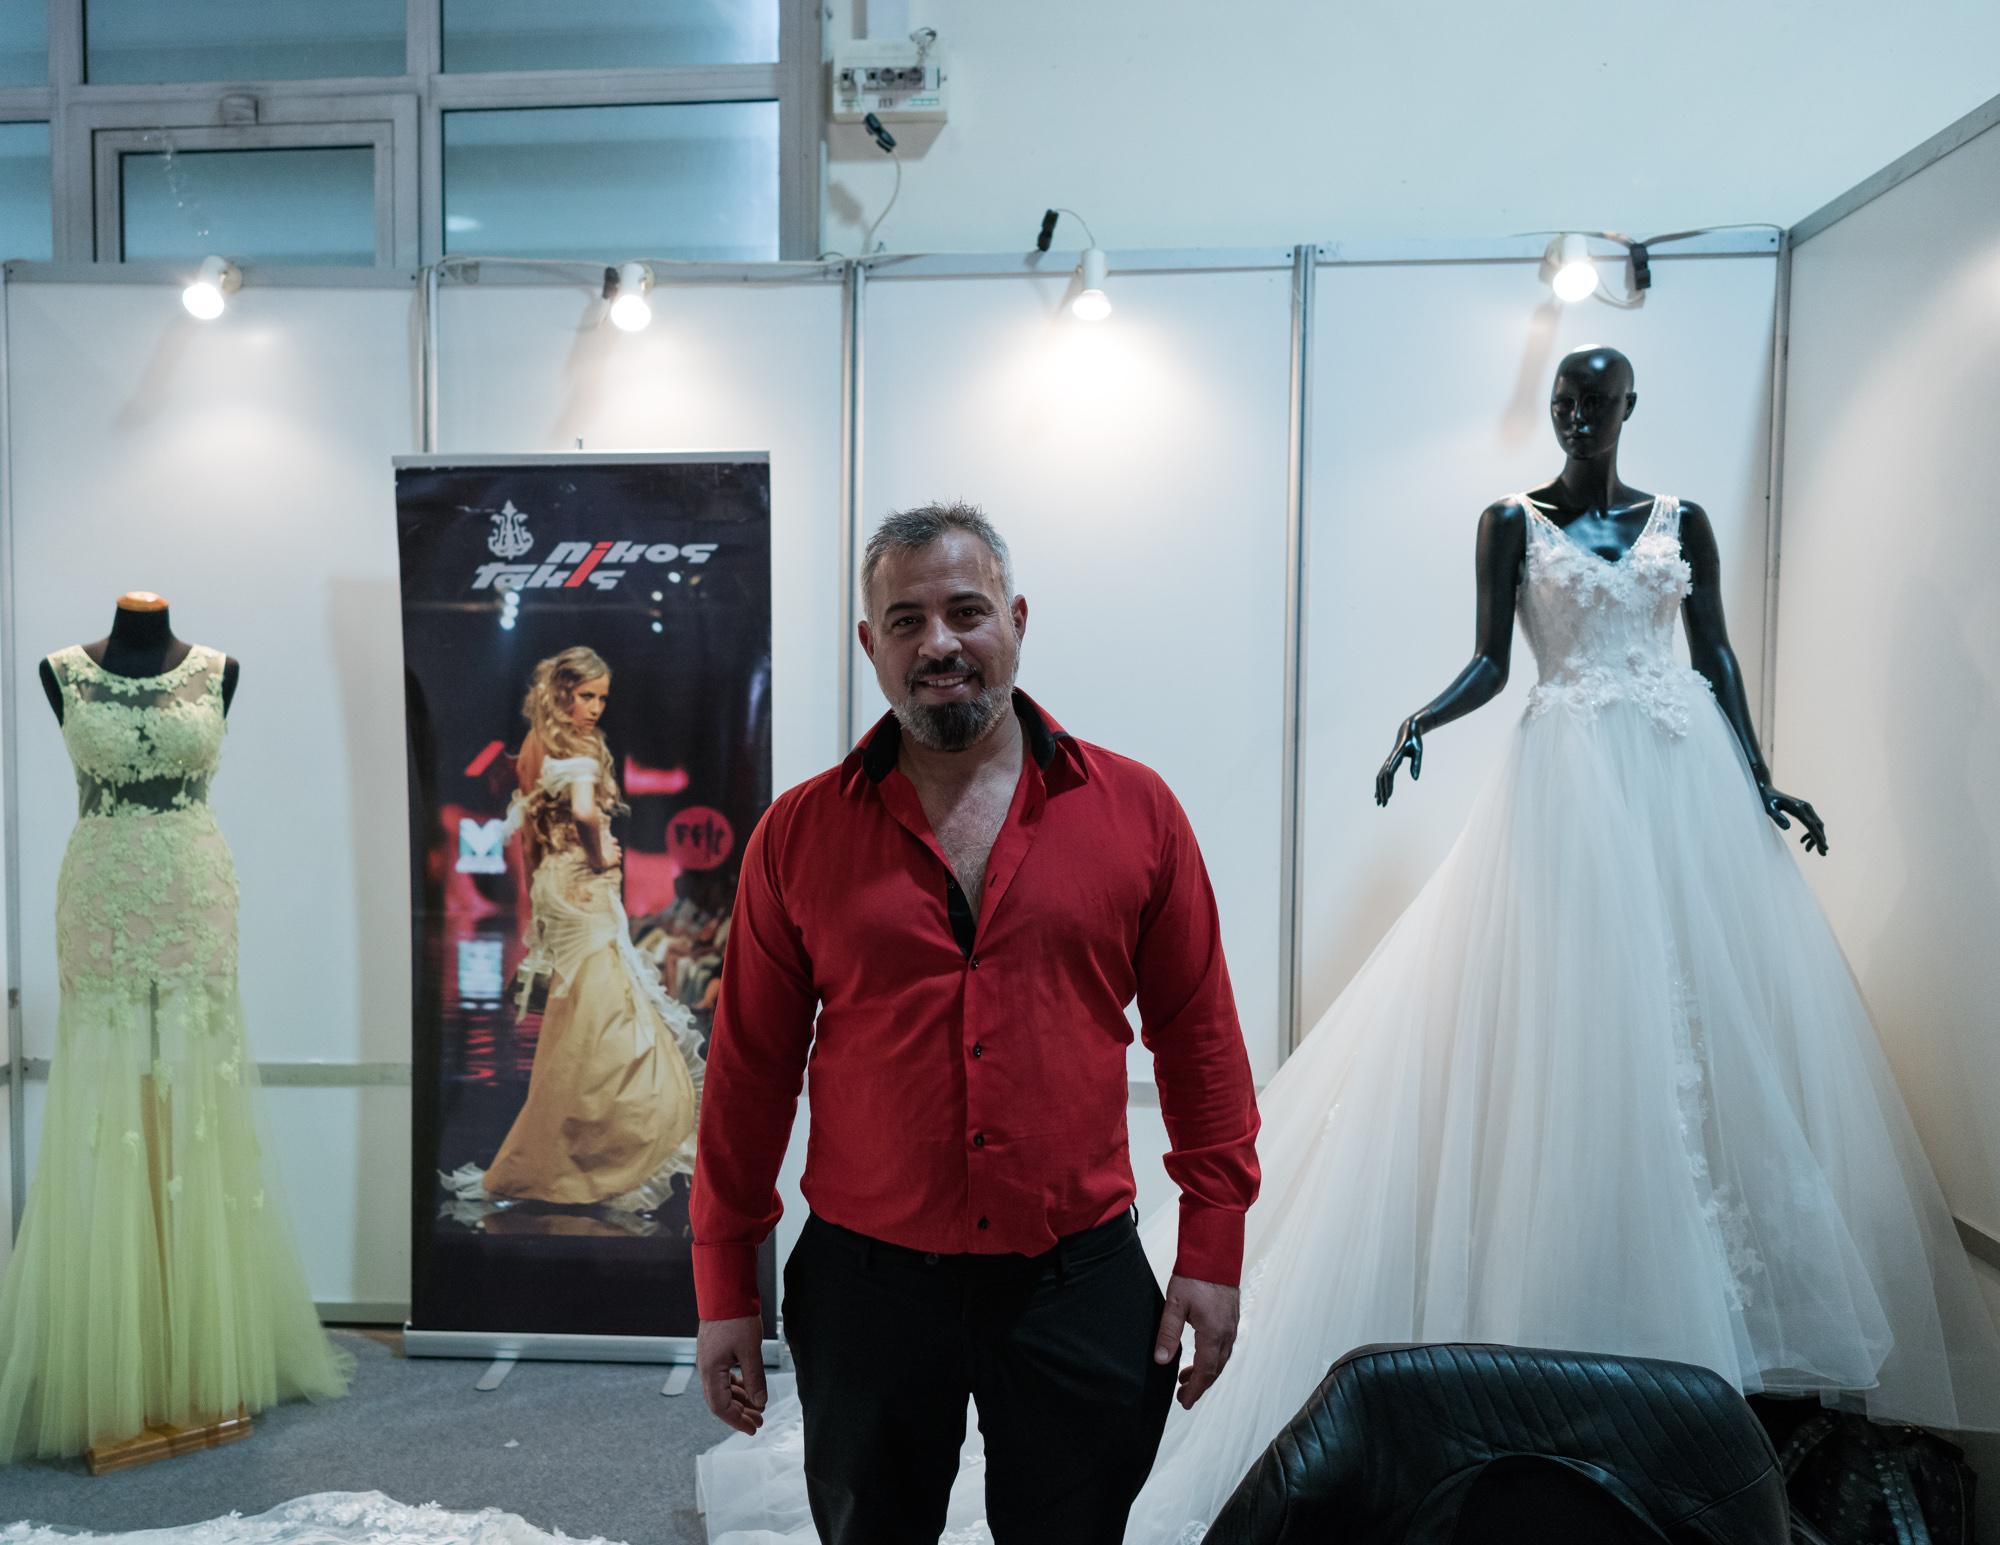 69e56f98a690 Όλα όσα Έμαθα για την Ελληνική Βιομηχανία του Γάμου Προσπαθώντας να ...